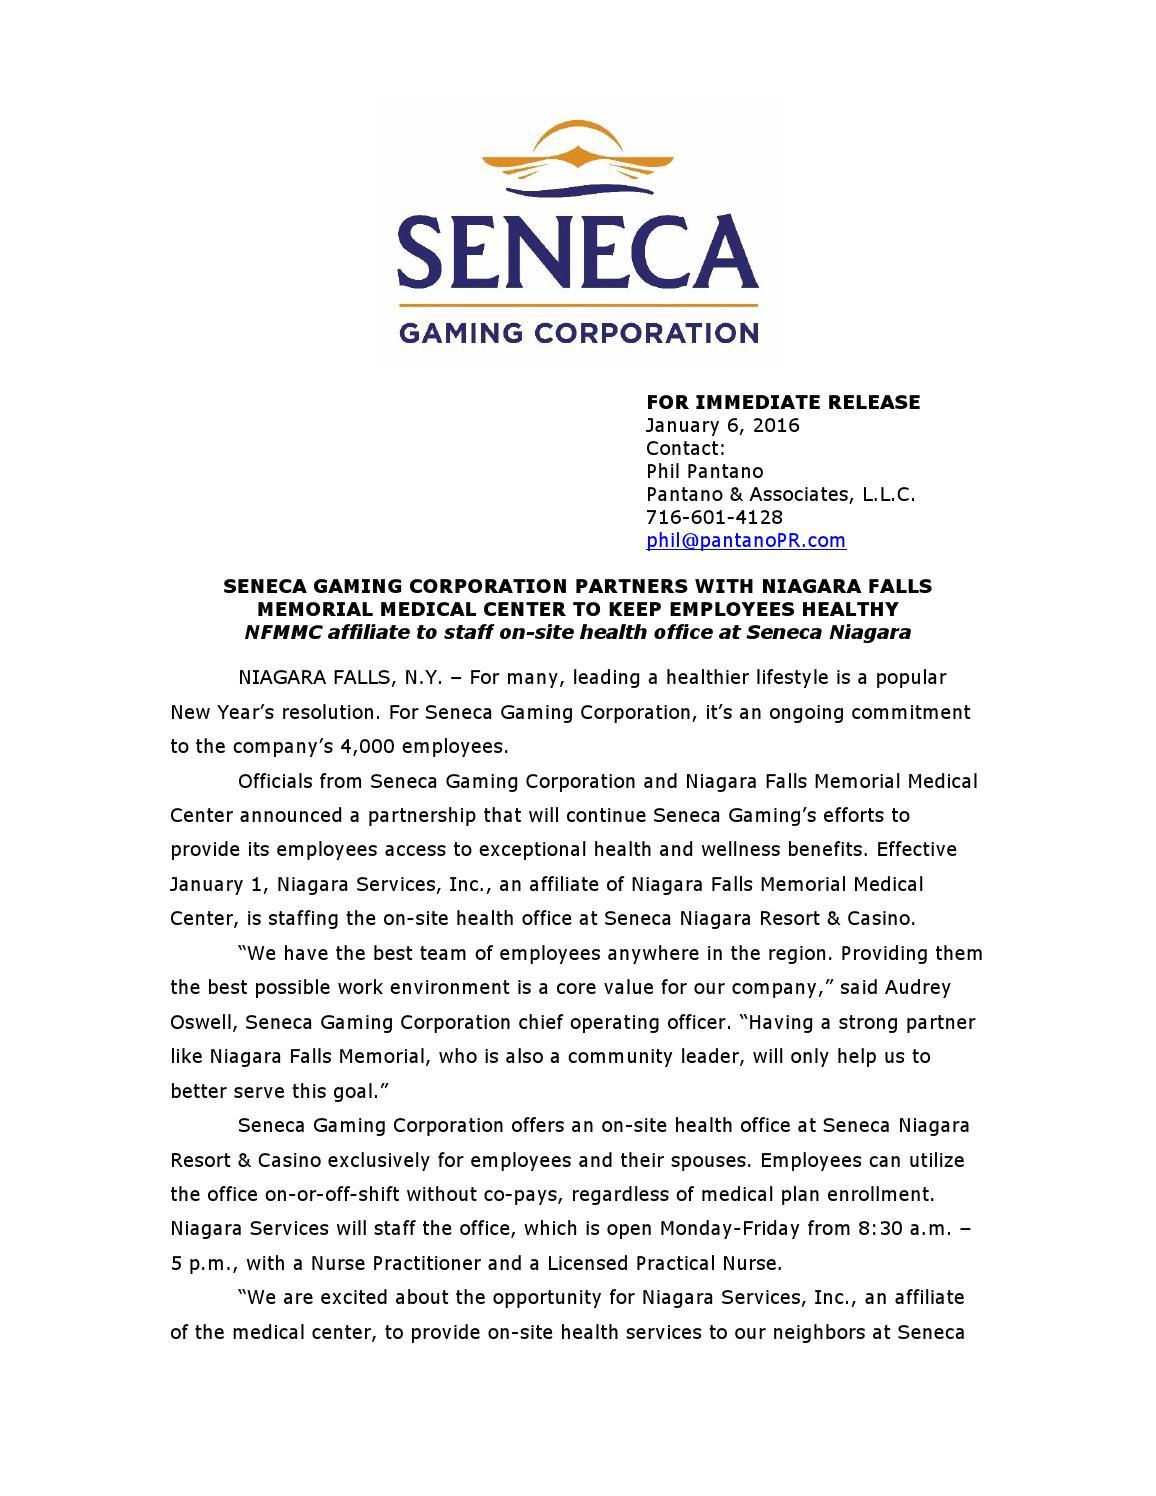 Seneca Gaming Corp. Partners with Niagara Falls Memorial ...